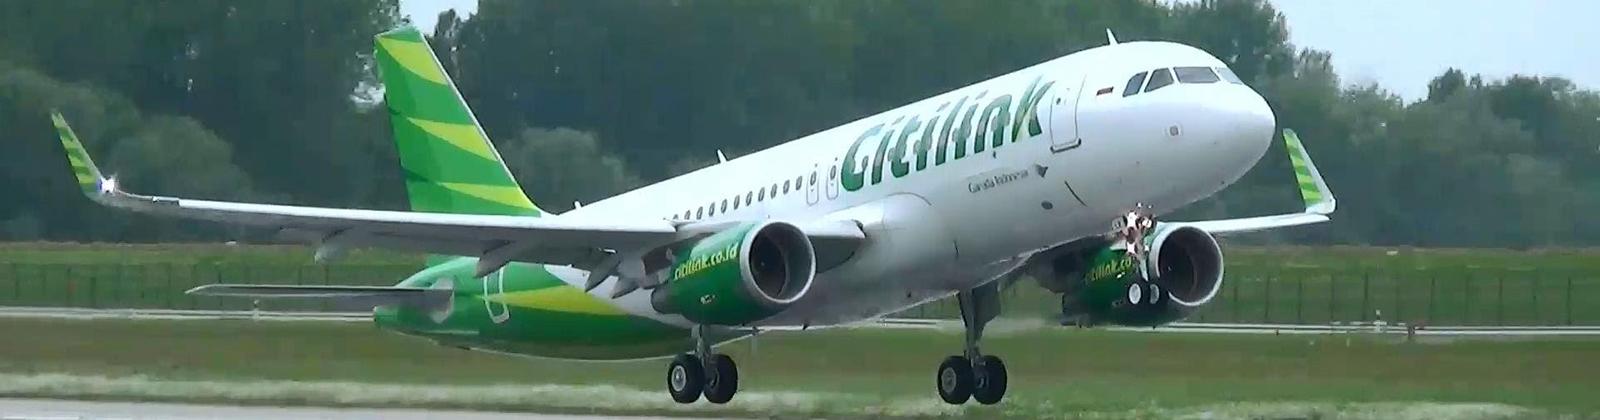 Informasi Refund Tiket Citilink Skyscanner Indonesia